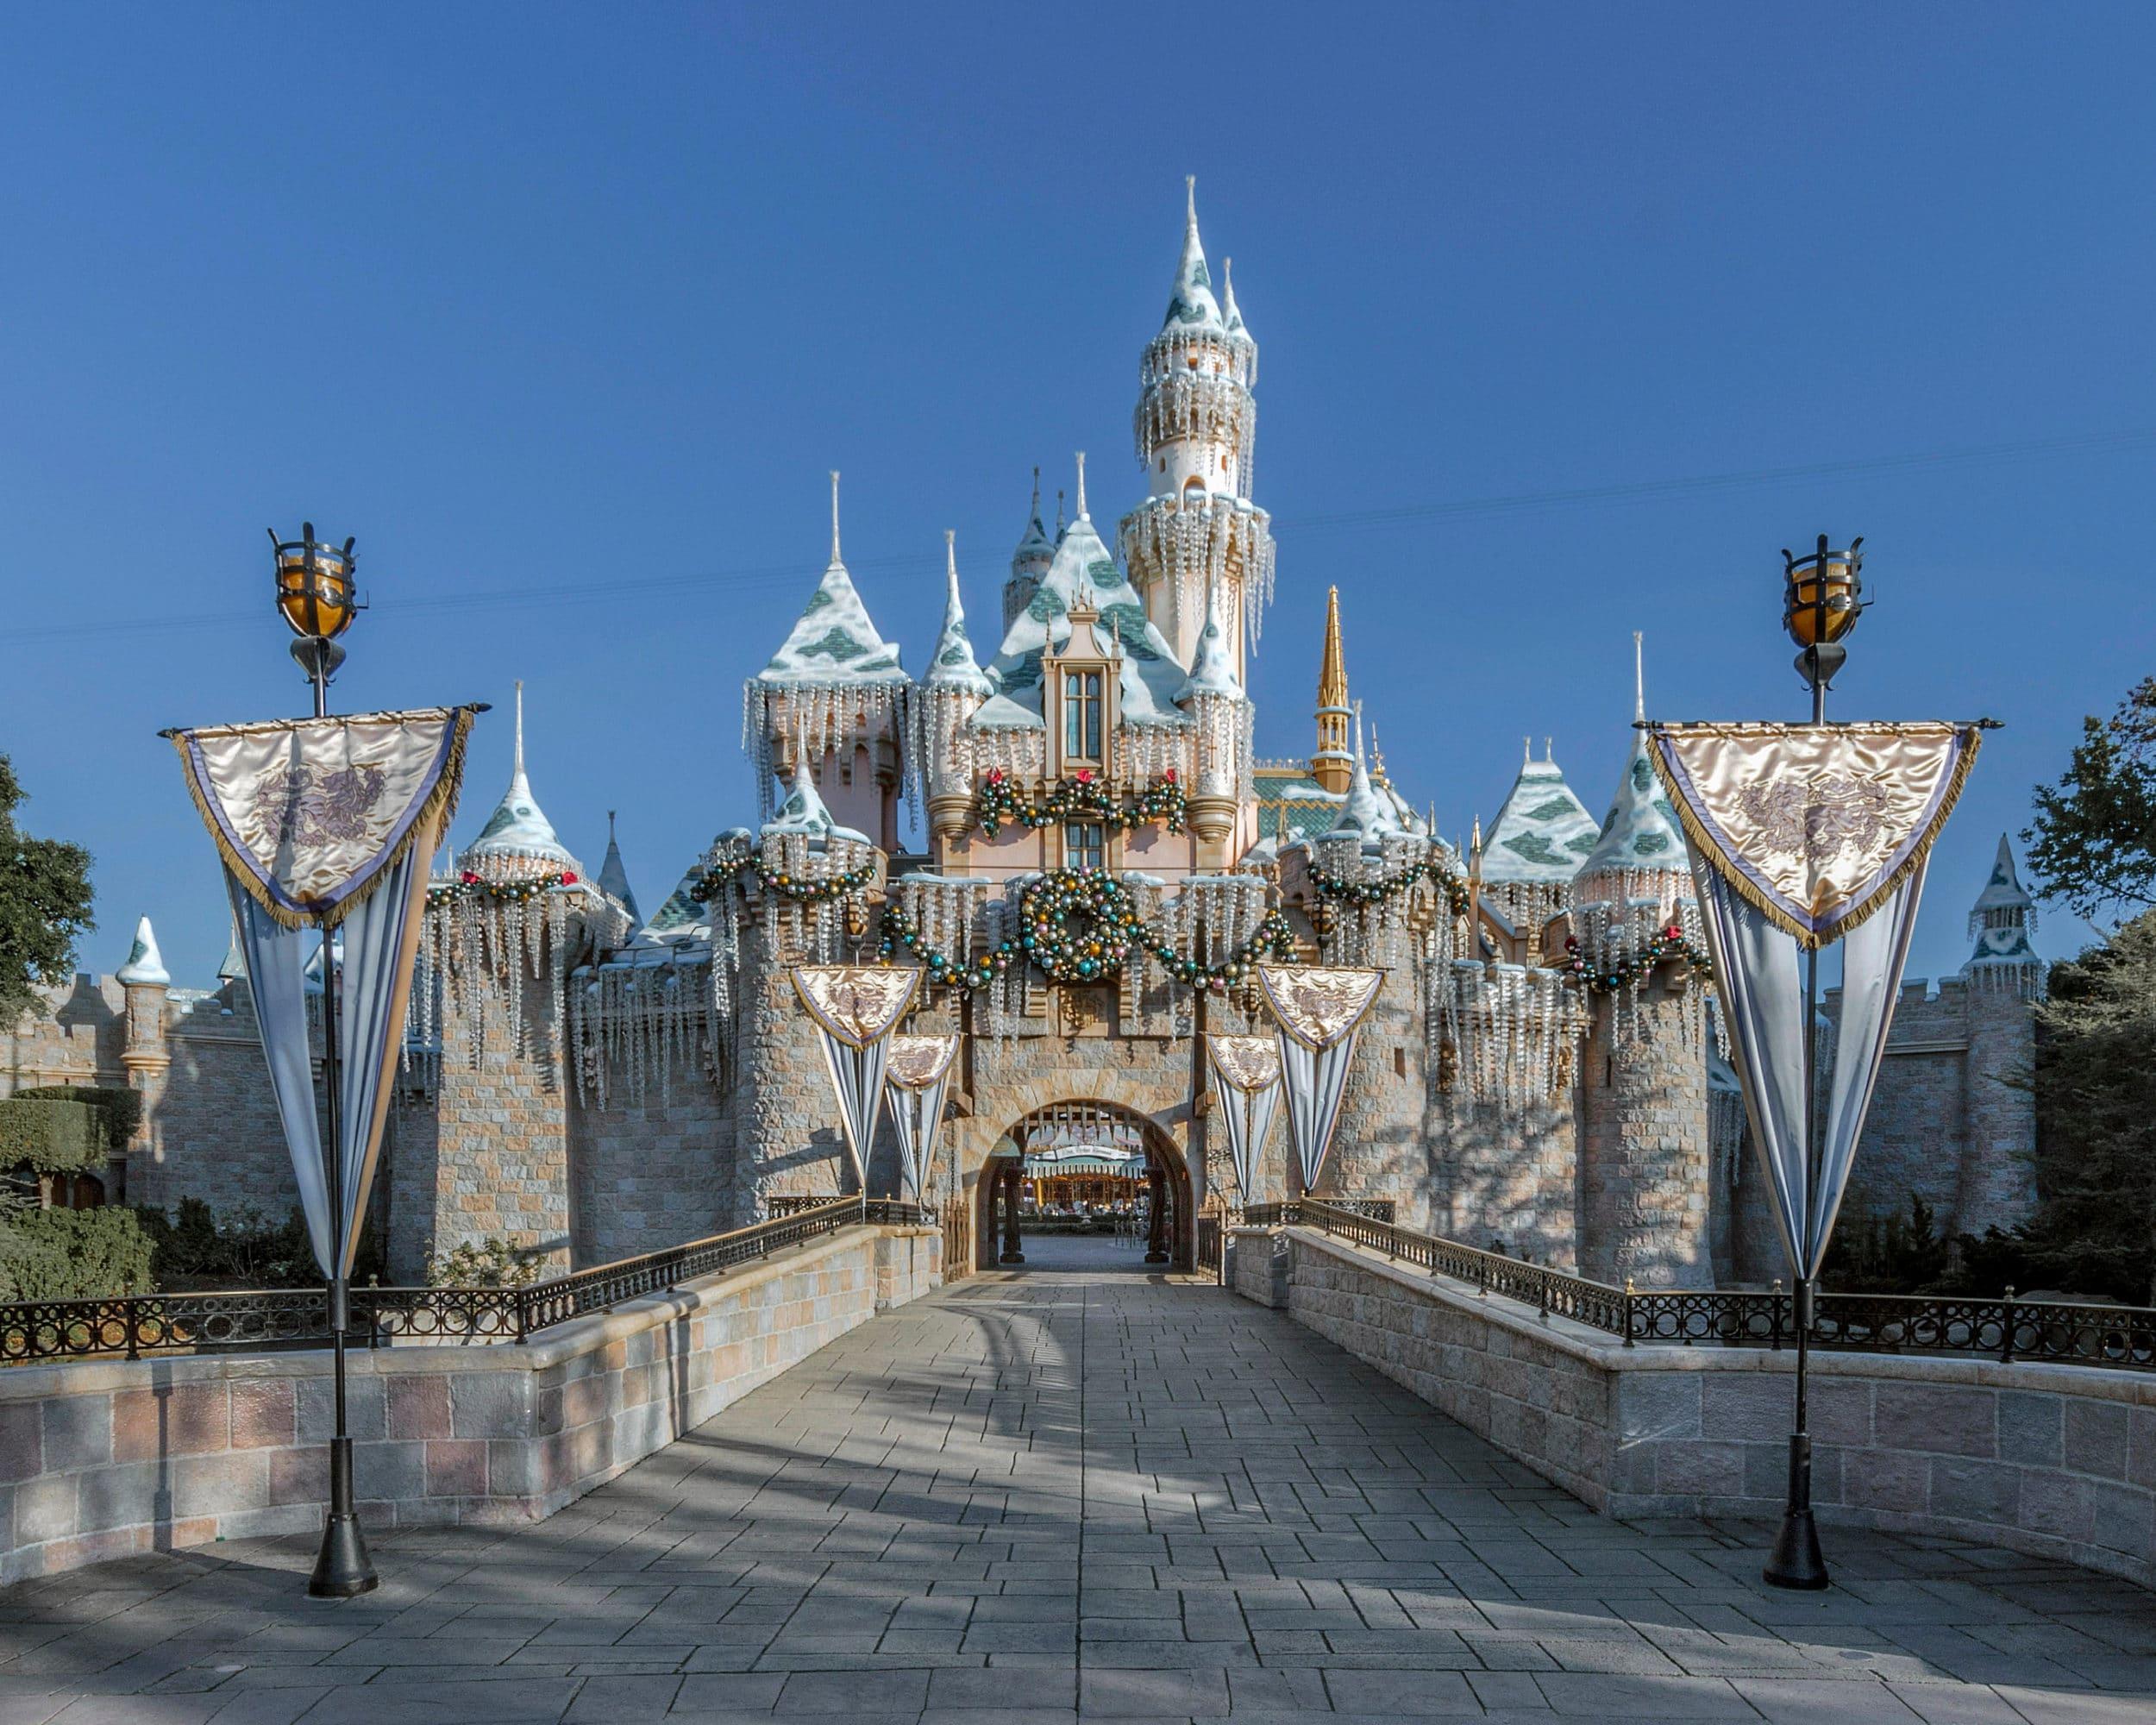 Sleeping Beauty's Winter Castle at Disneyland Resort